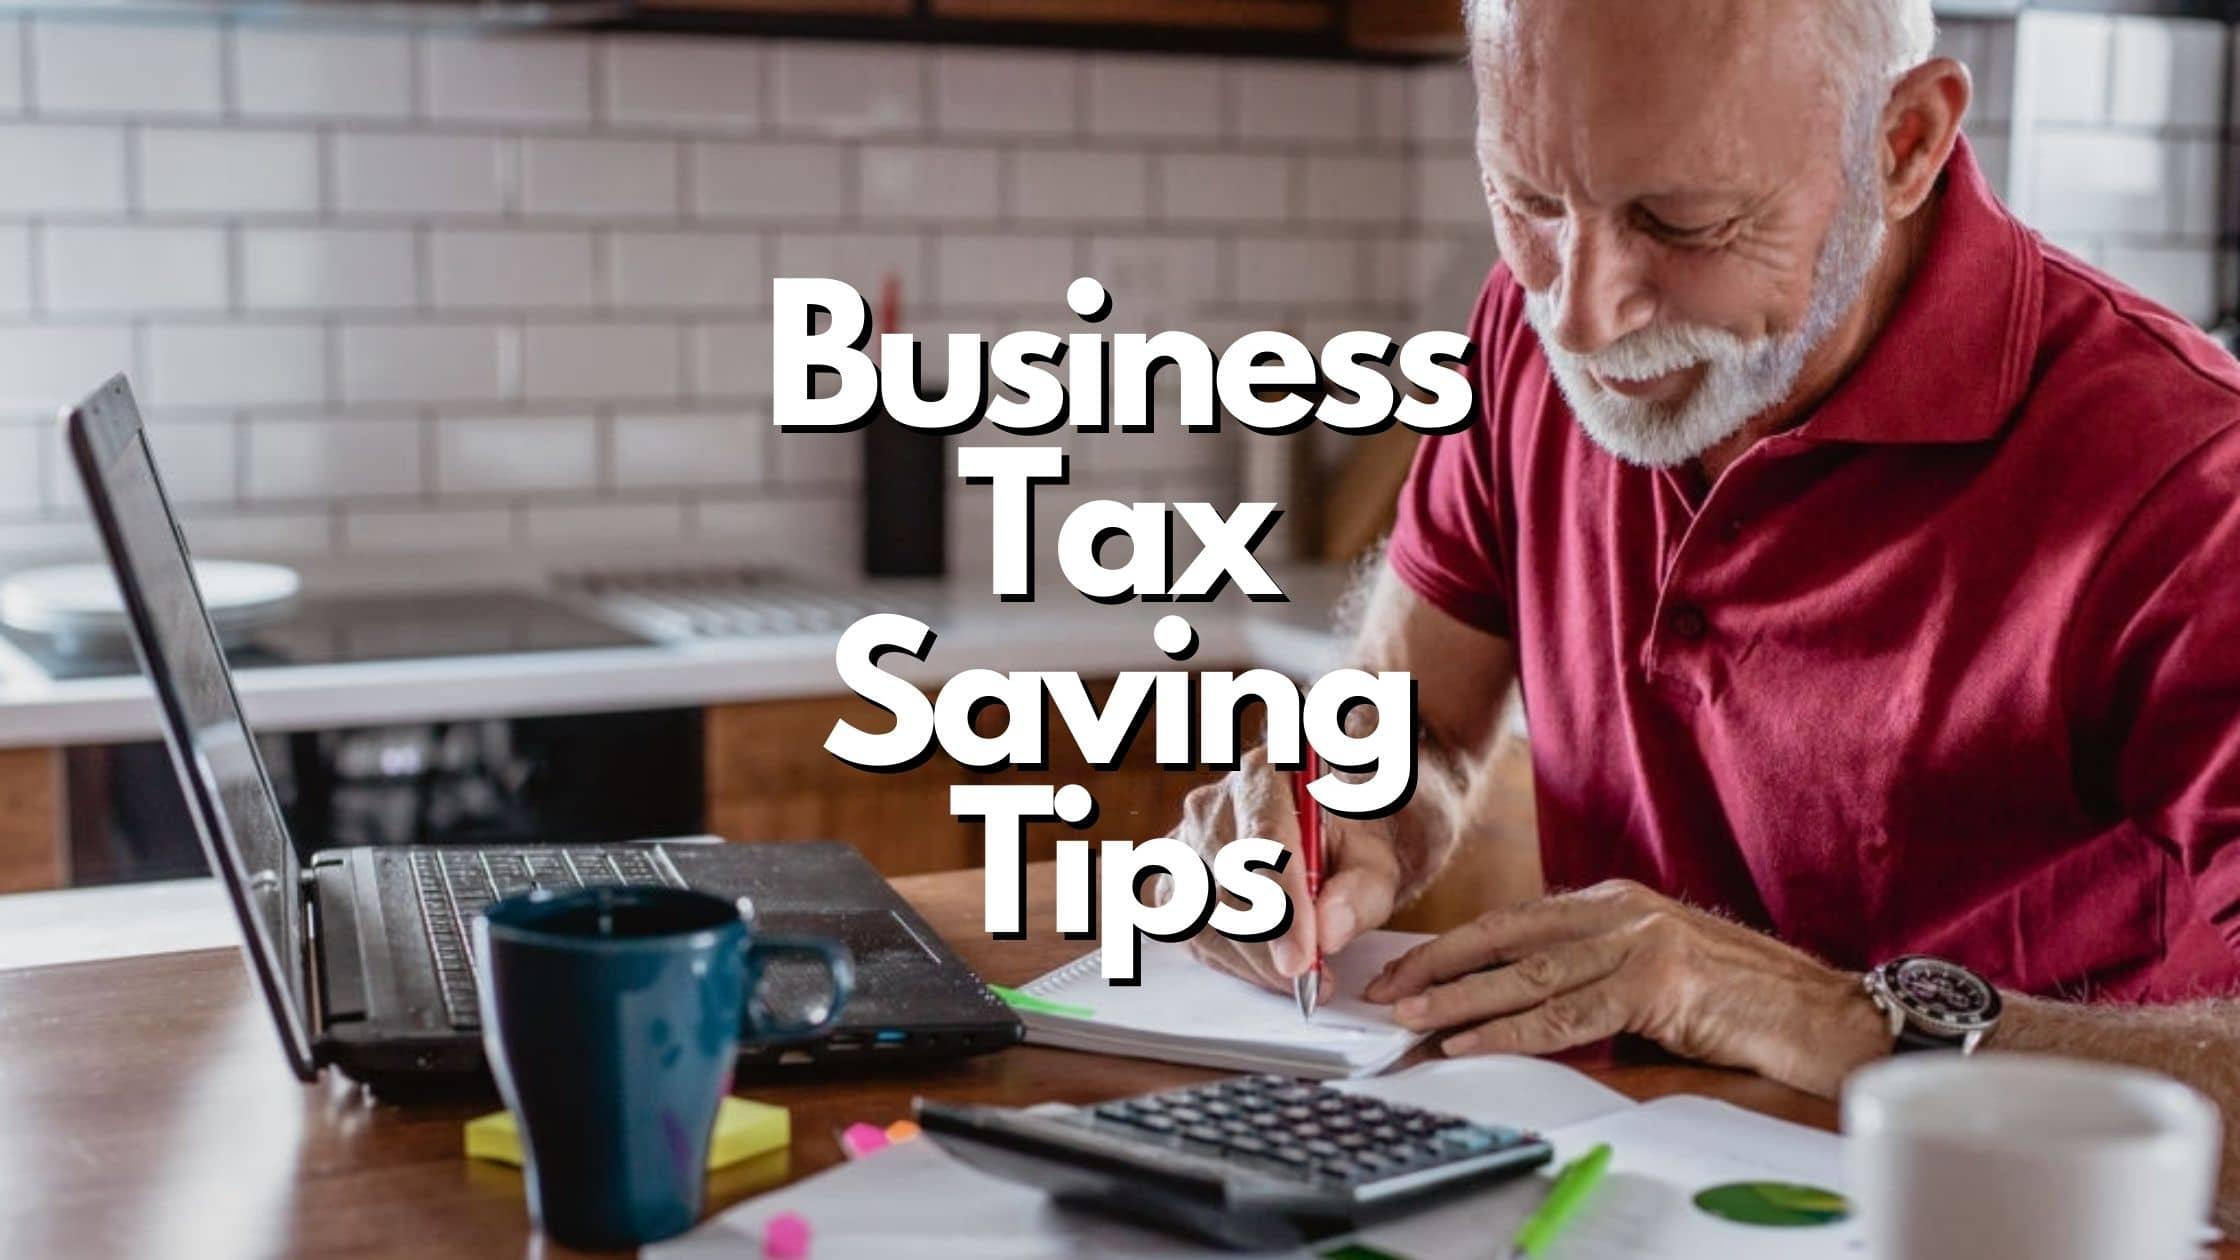 Business Tax Saving Tips 2021